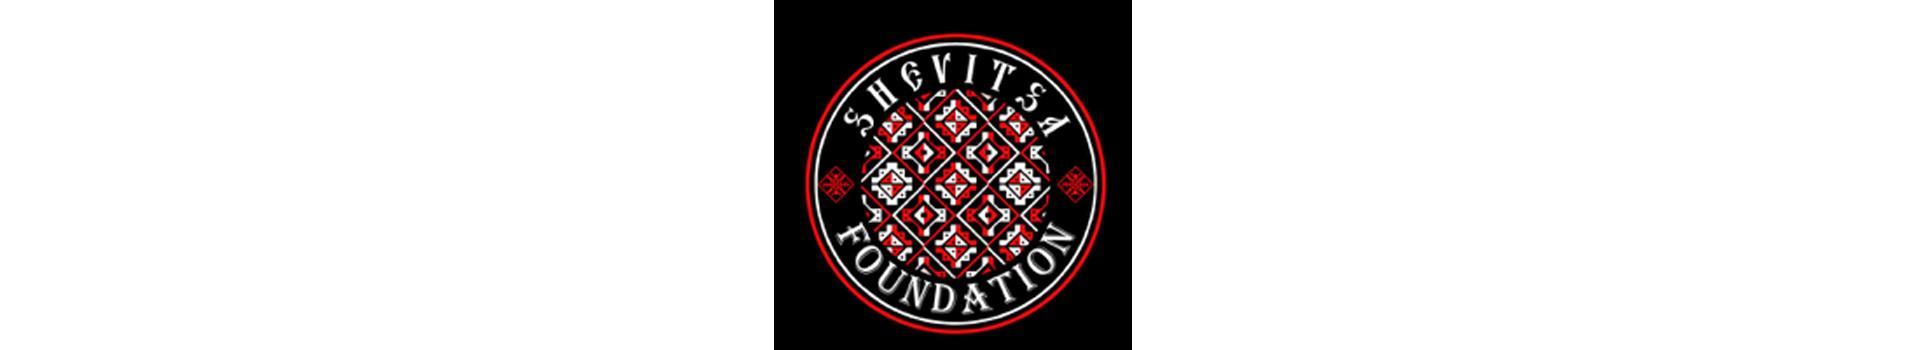 shevitsa foundation